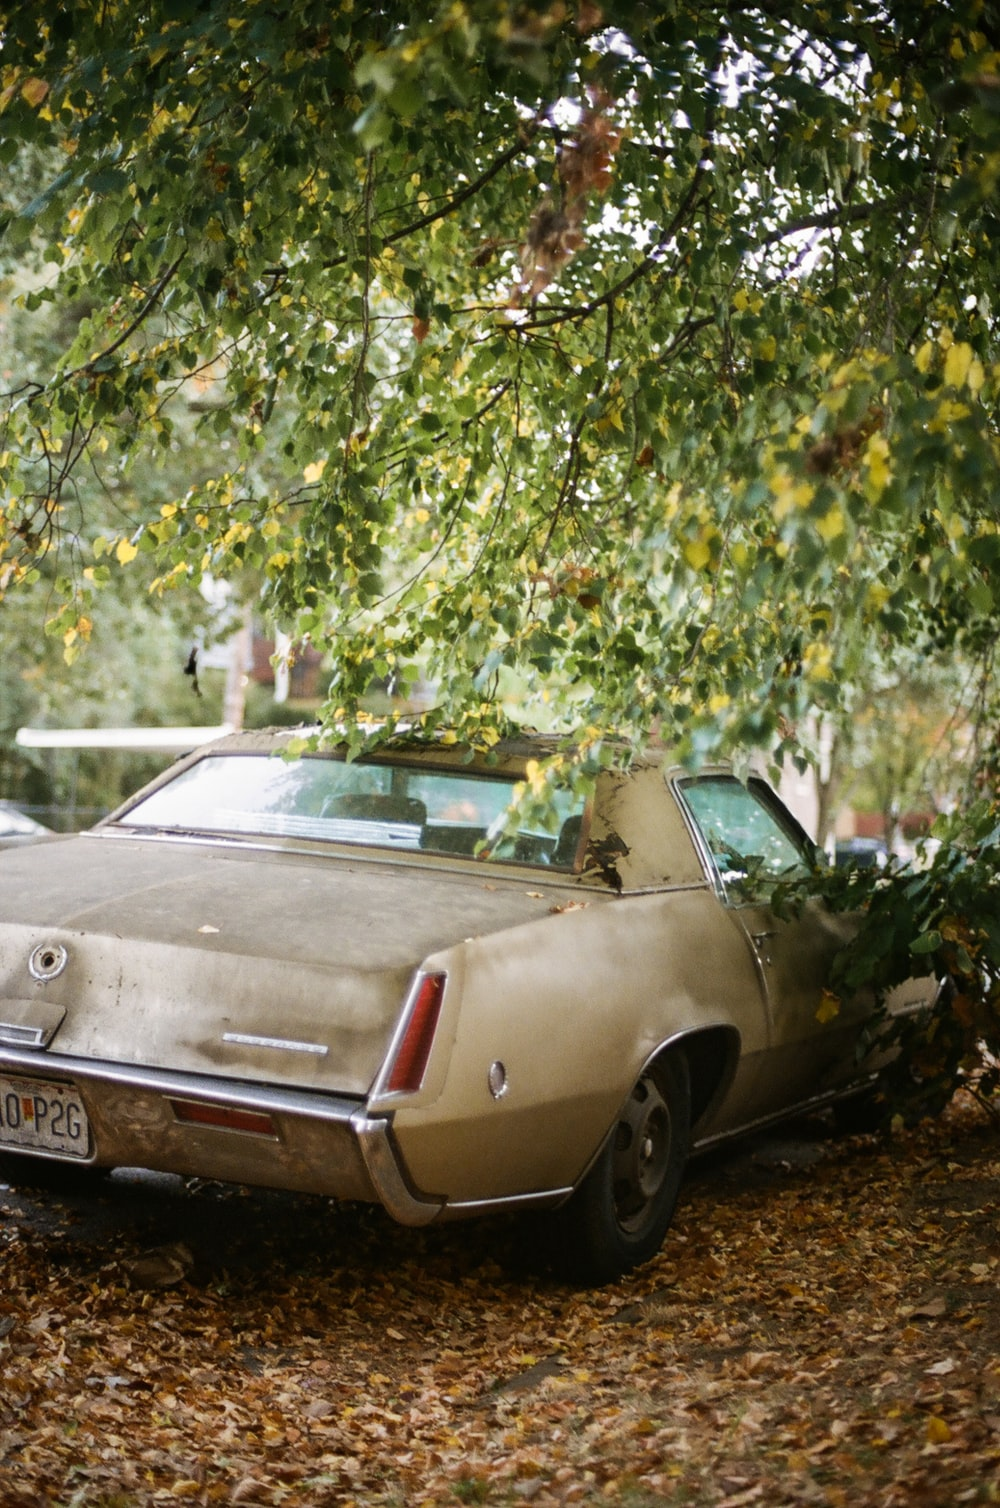 grey chevrolet camaro parked near green leaf tree during daytime